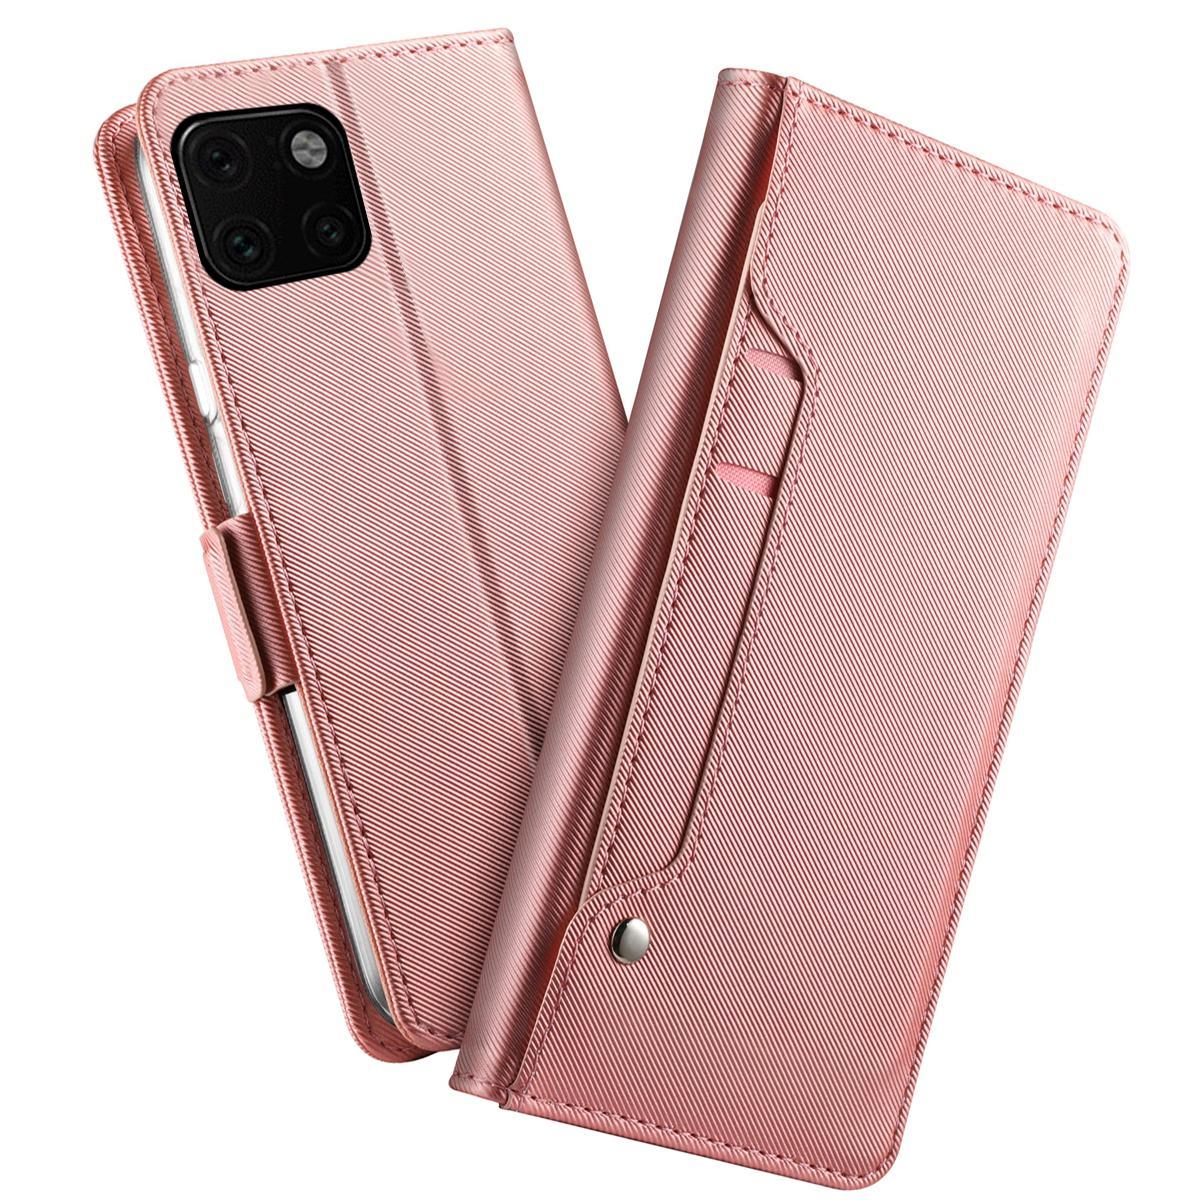 Plånboksfodral Spegel iPhone 11 Rosa Guld